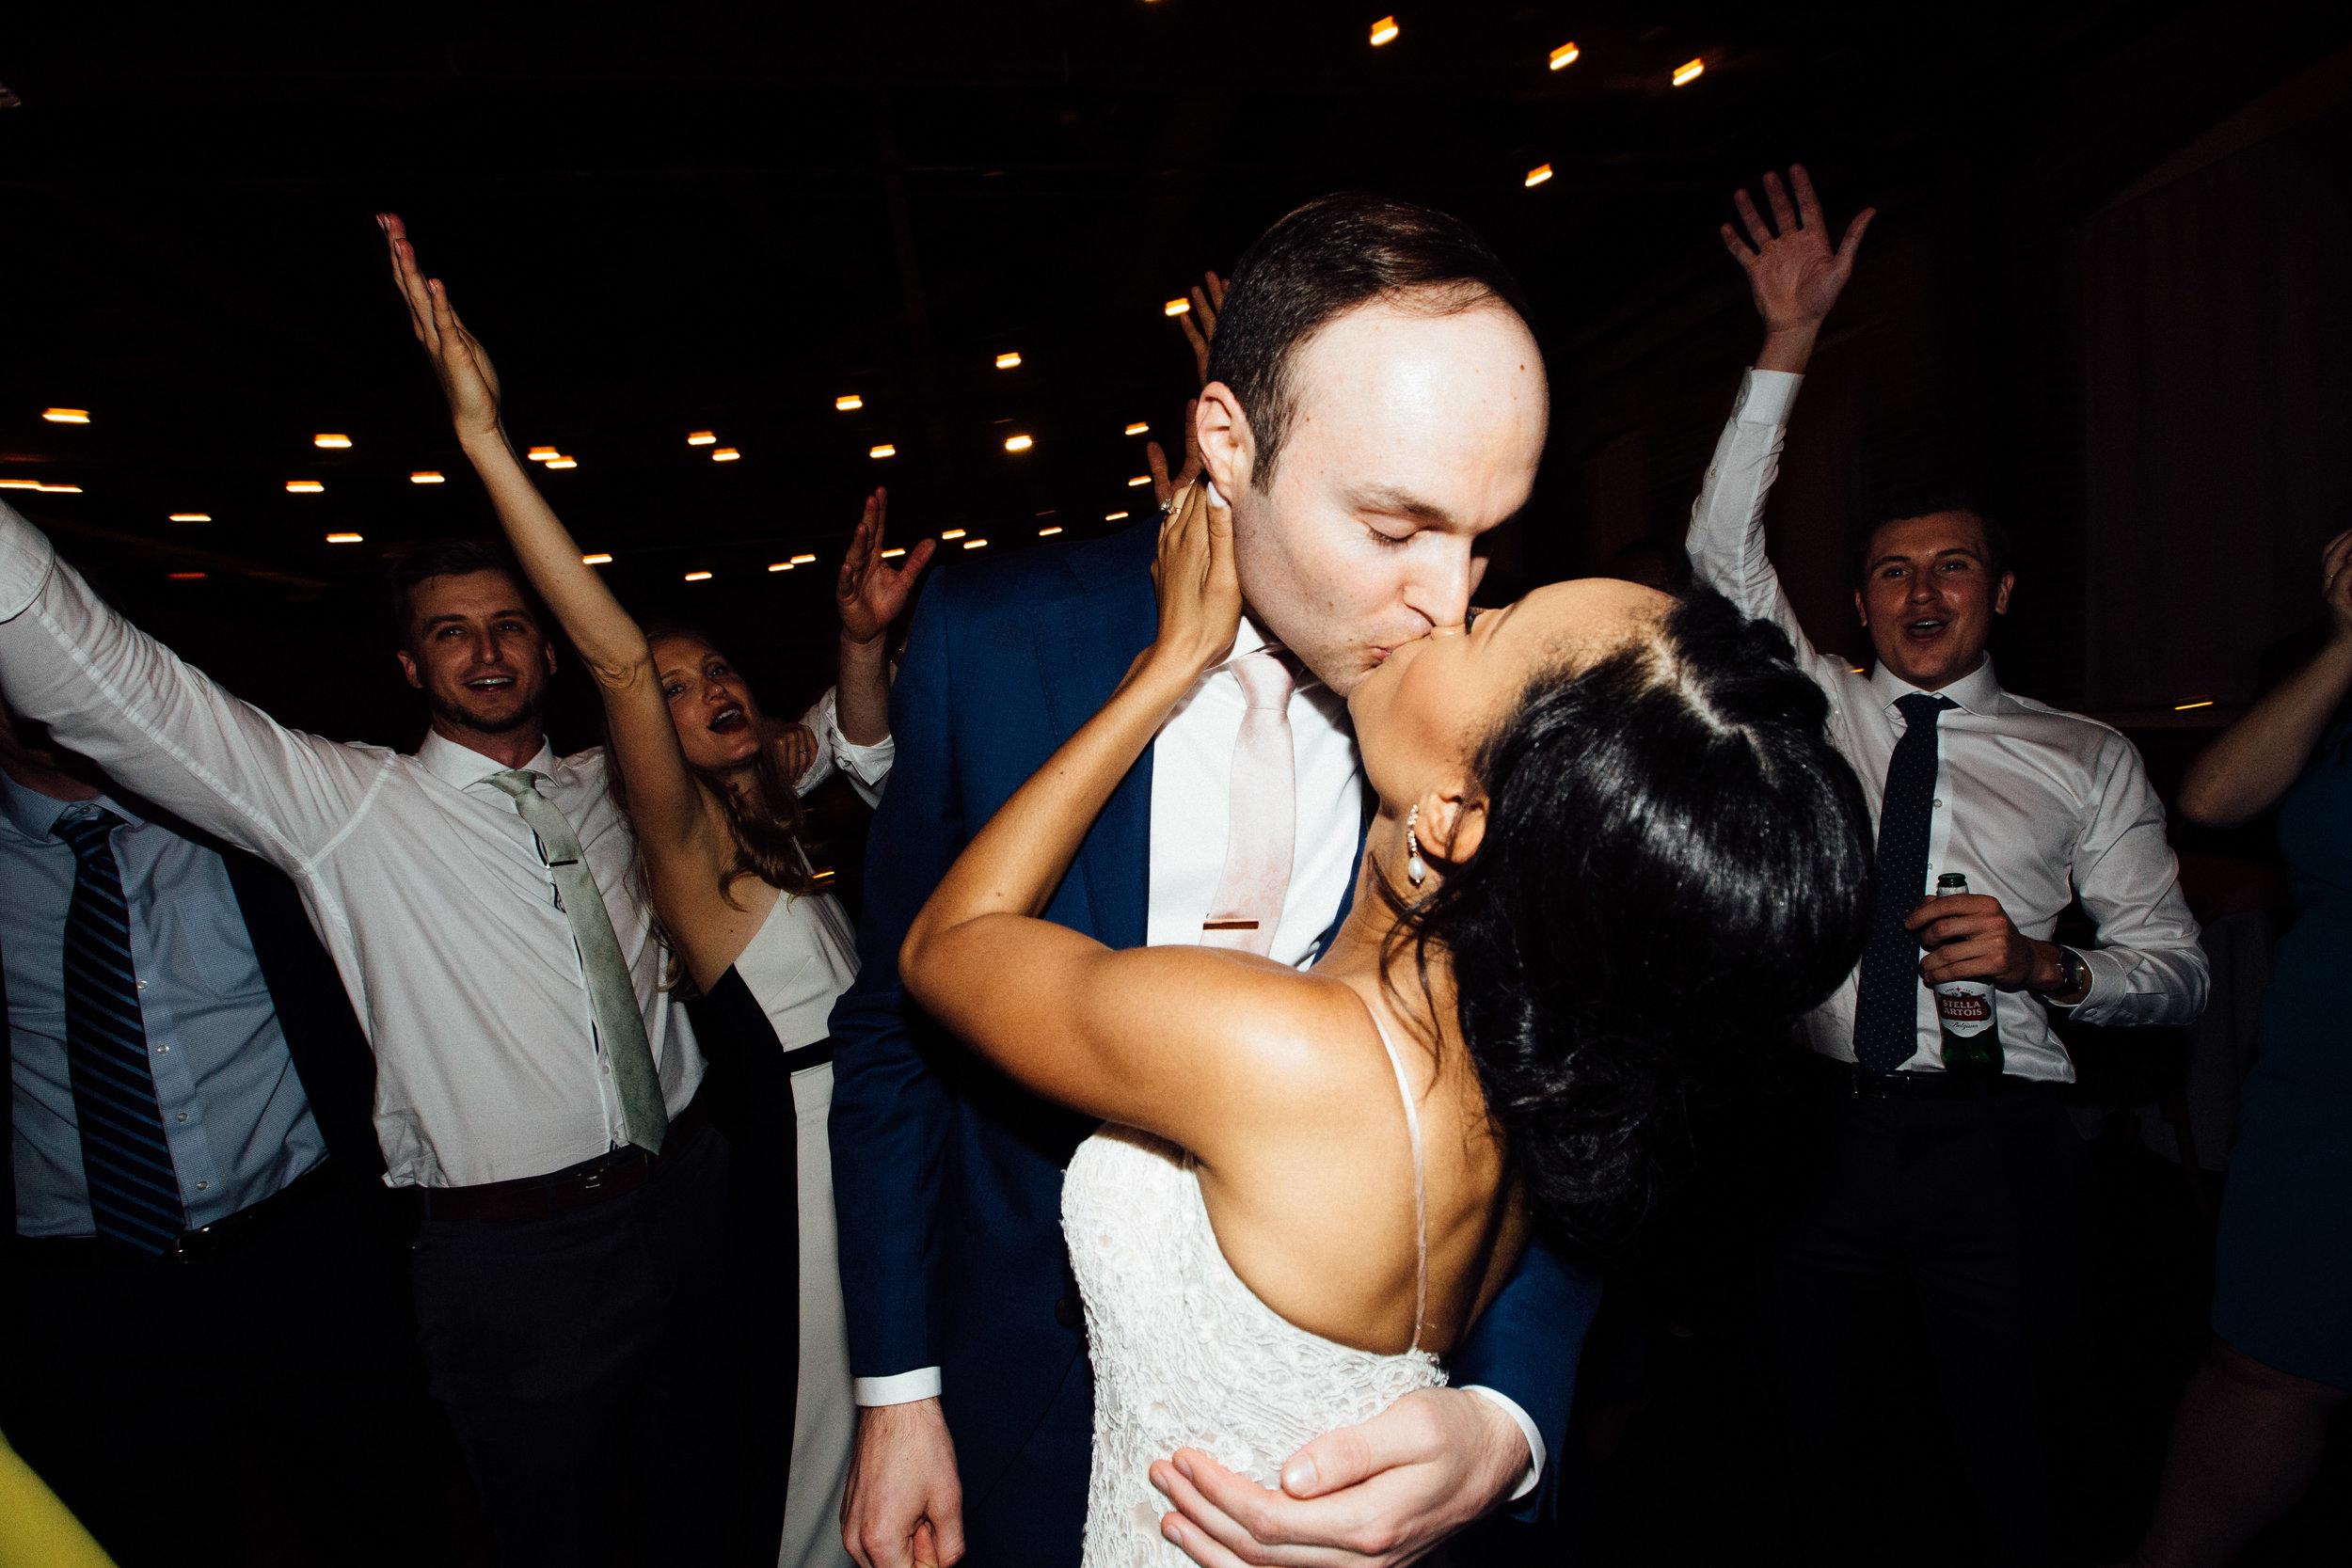 king_plow_atlanta_wedding_art_gallery_modern_lifestyle_documentary_2102.jpg